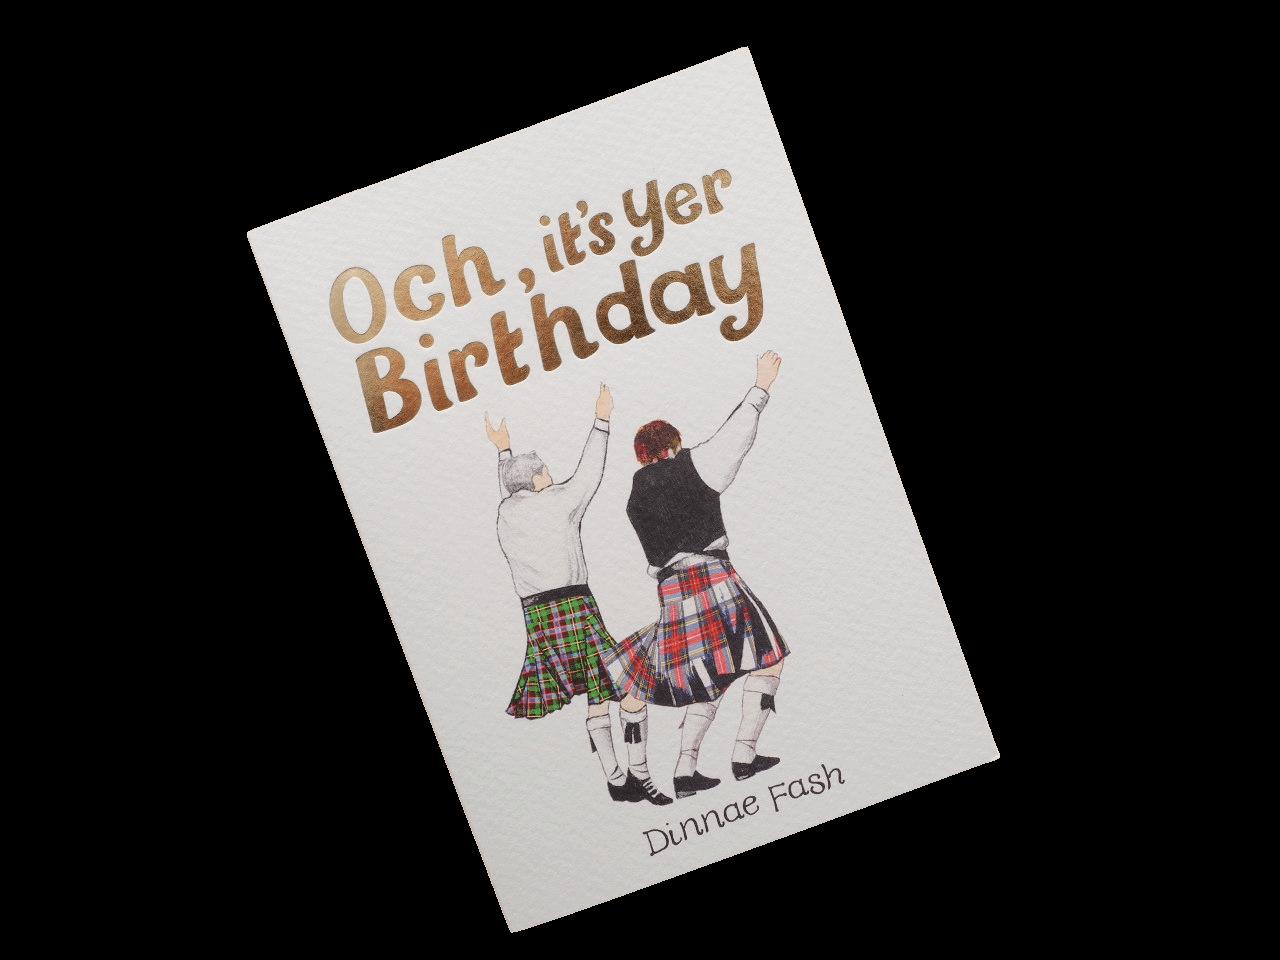 scottish birthday card tartan kilts dancers scots doric language